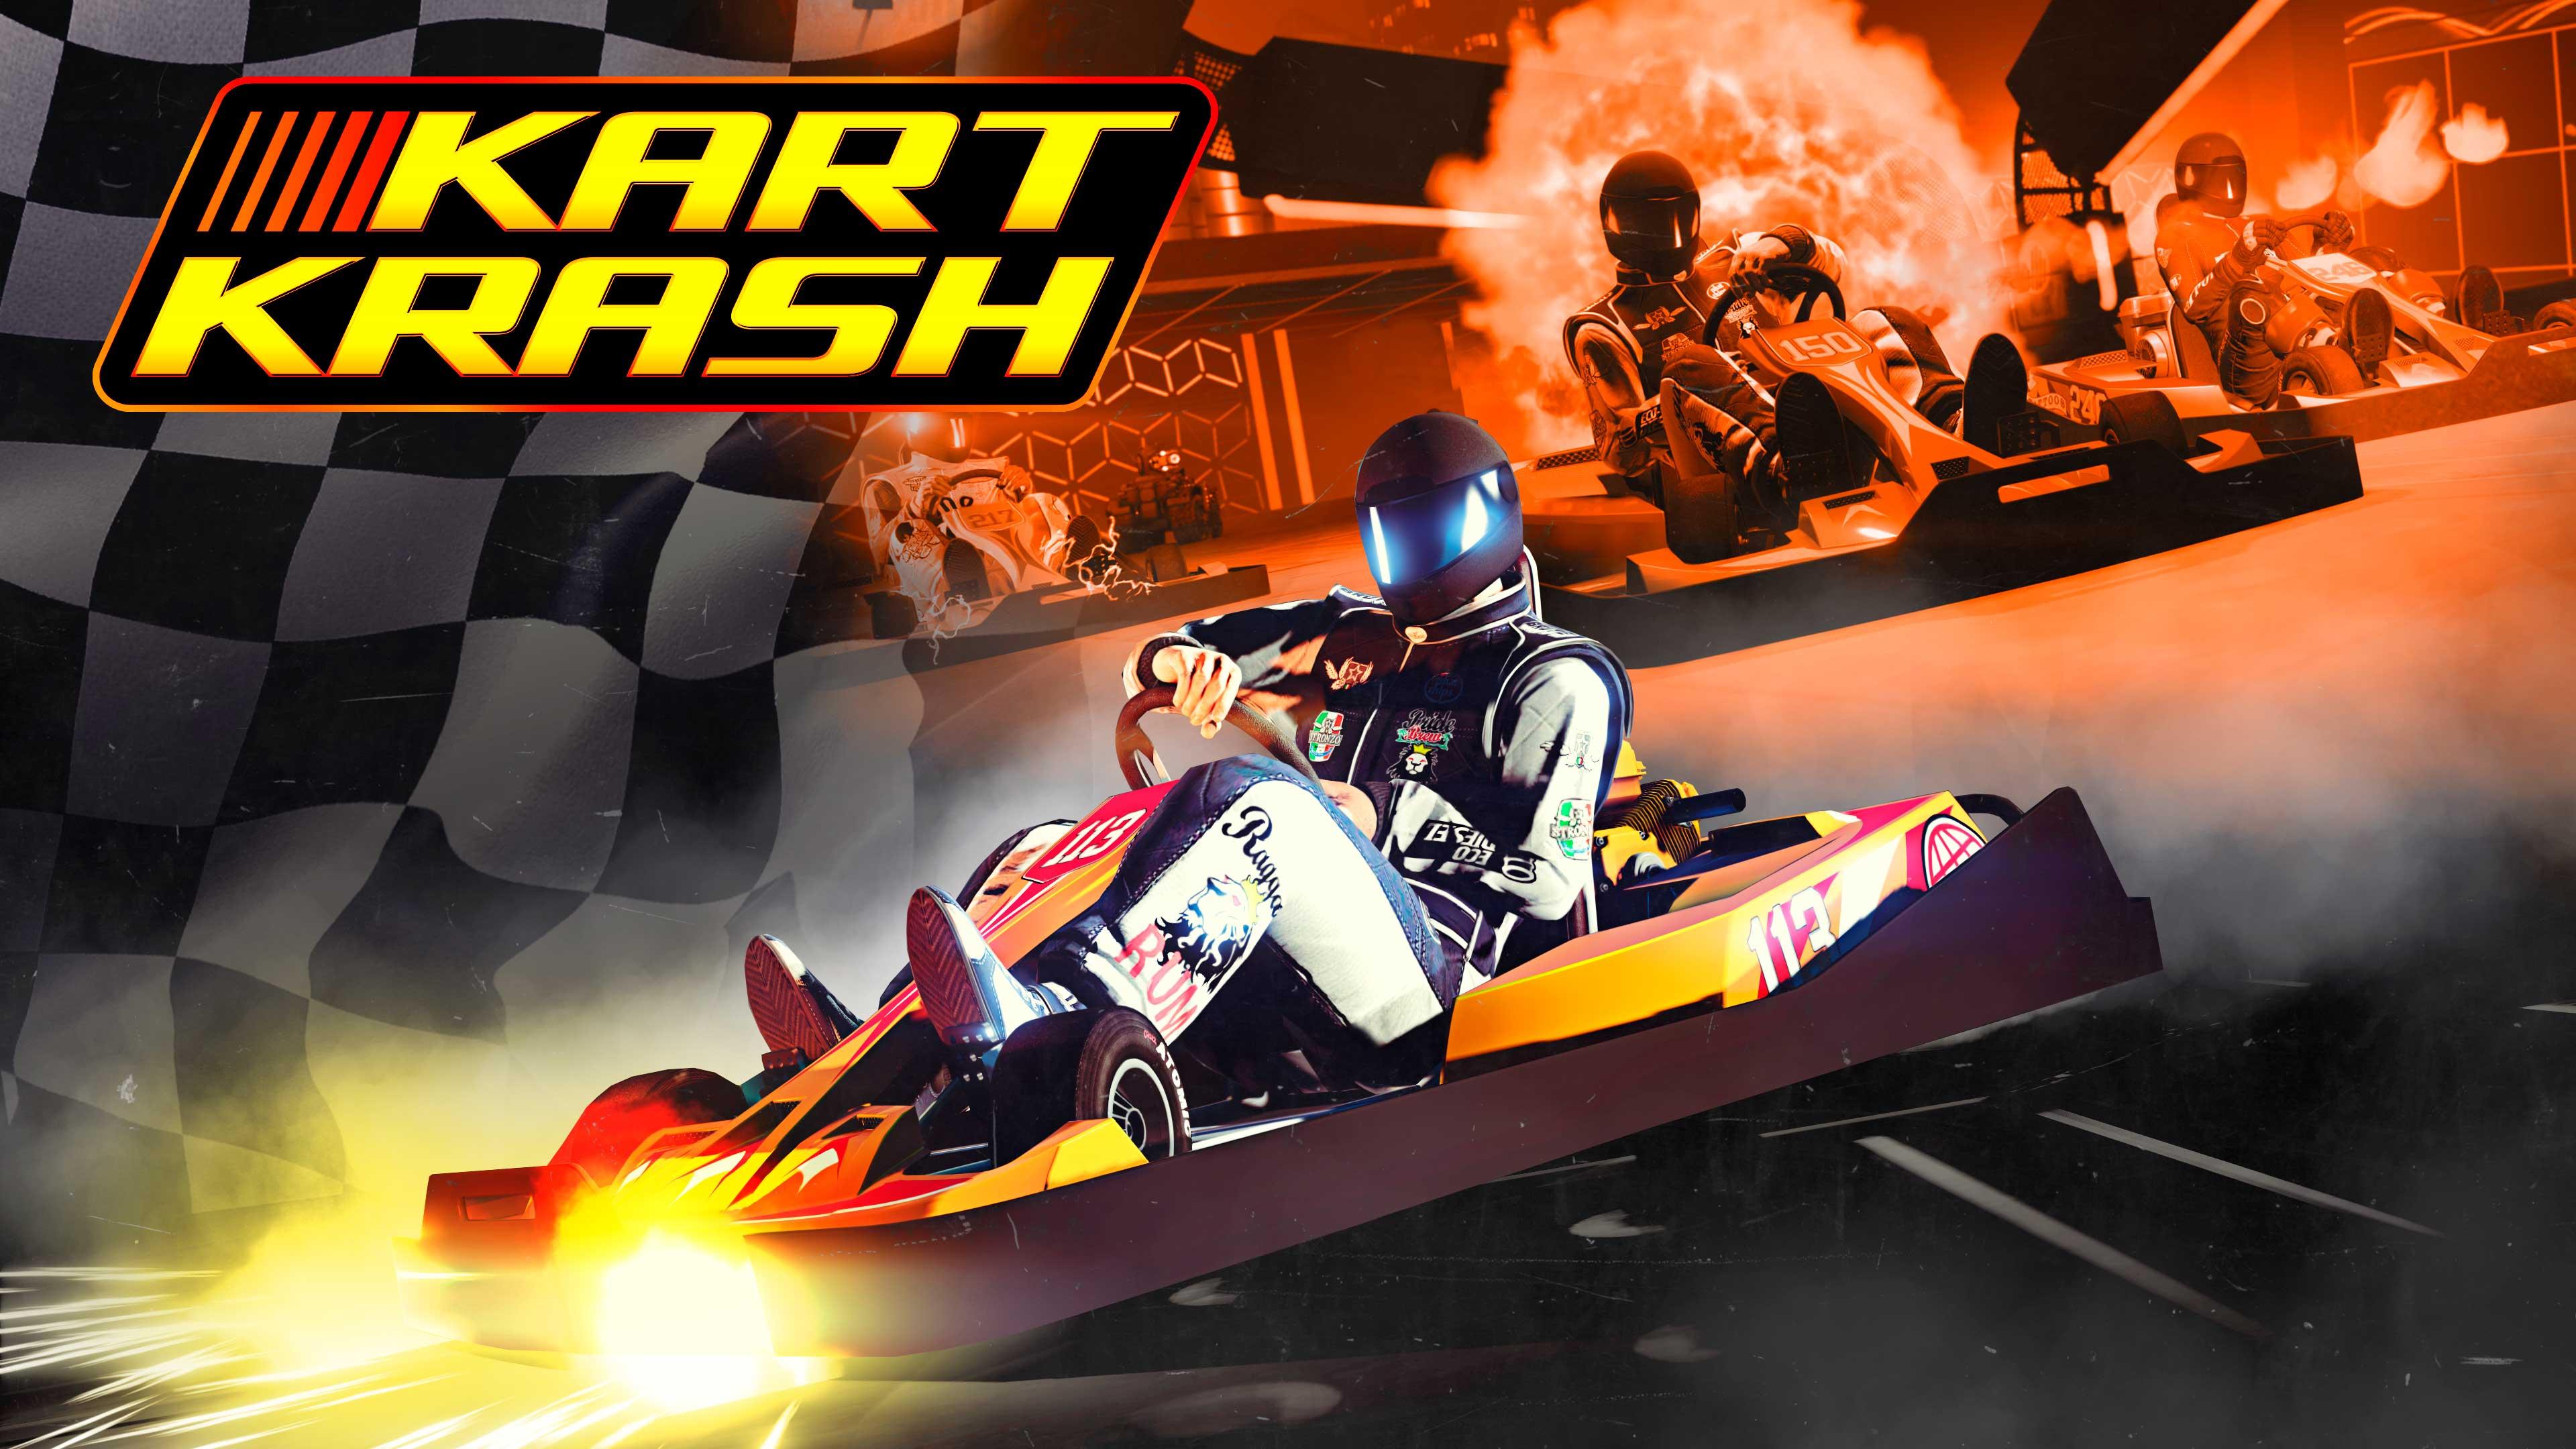 GTA Online Kart Crash